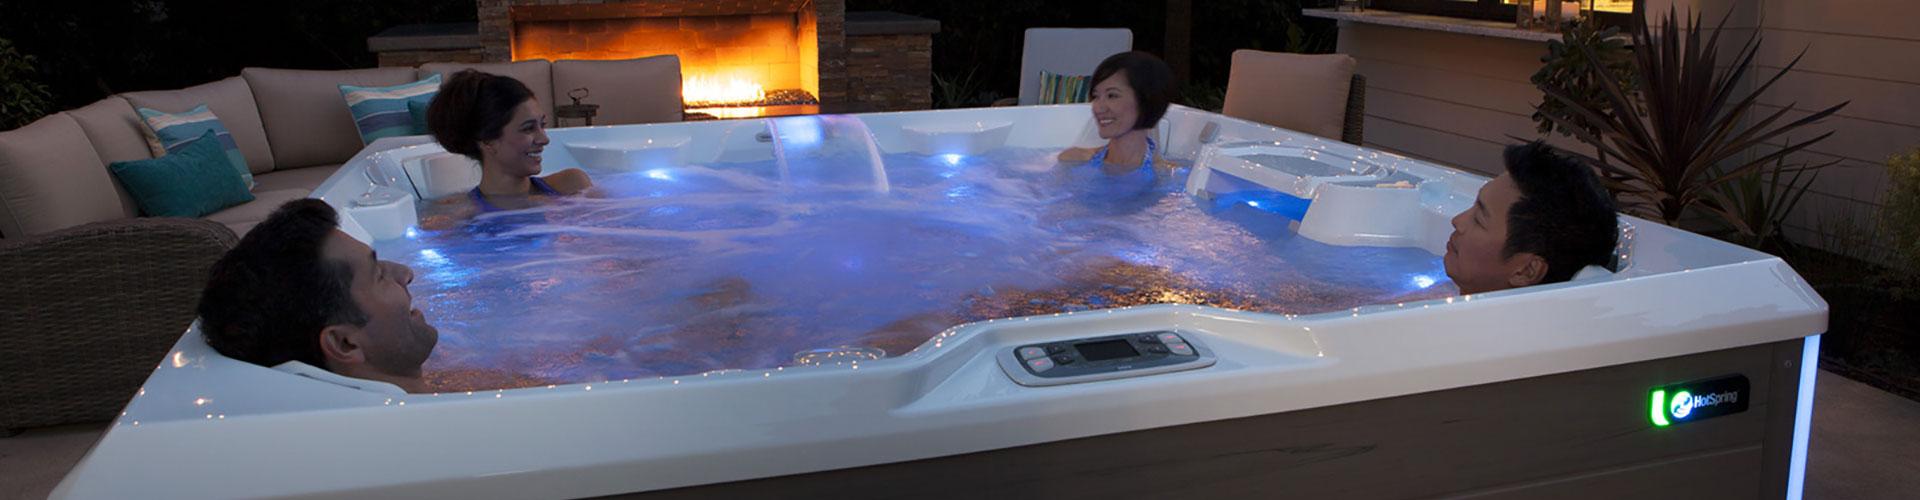 Hot Tubbing – 3 Amazing Benefits, Hot Tubs Carroll, Portable Spas Sale Des Moines